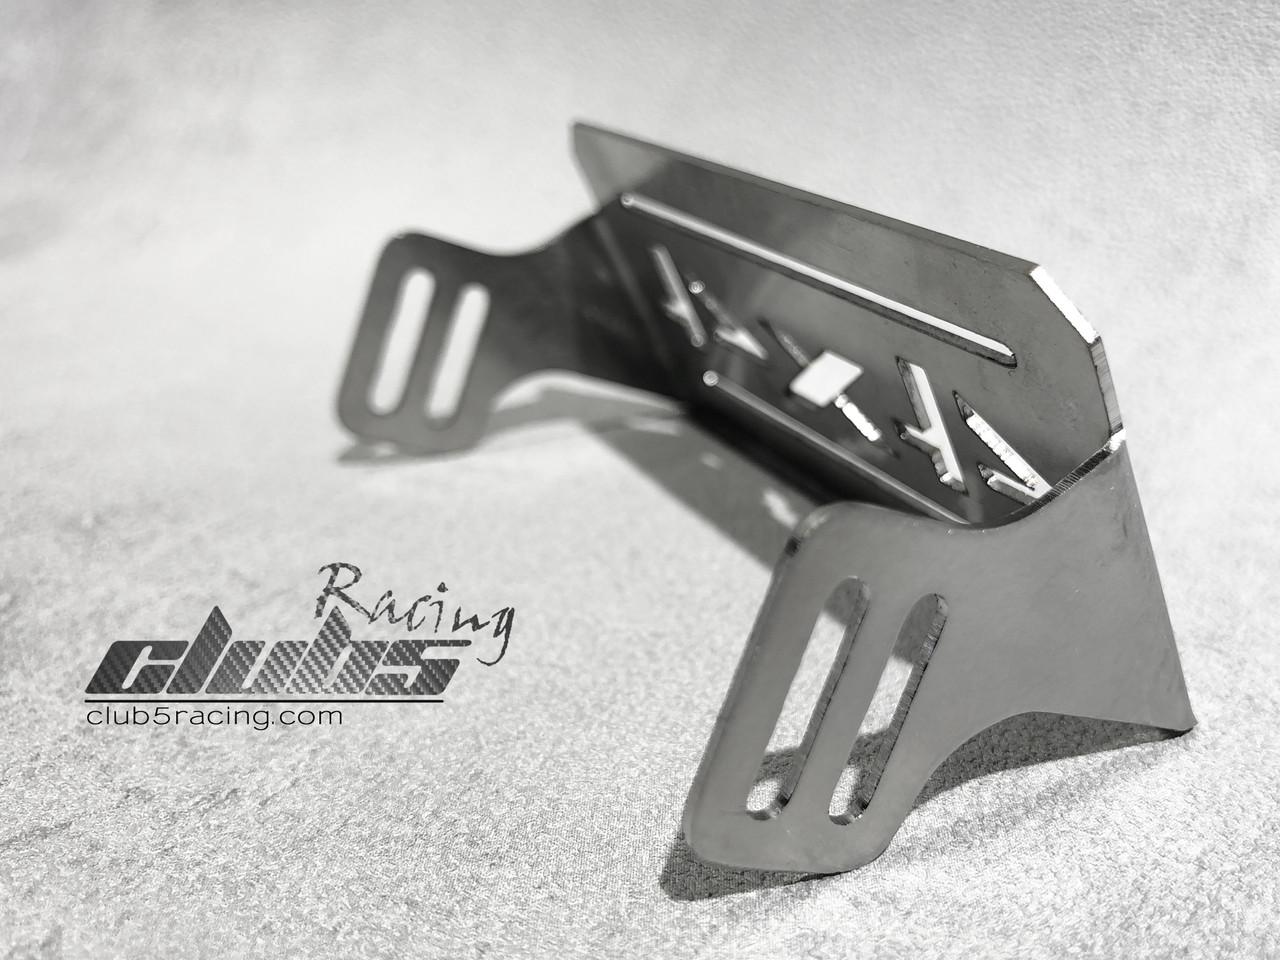 Front Skid Plate / Servo Guard for Vanquish VS4-10